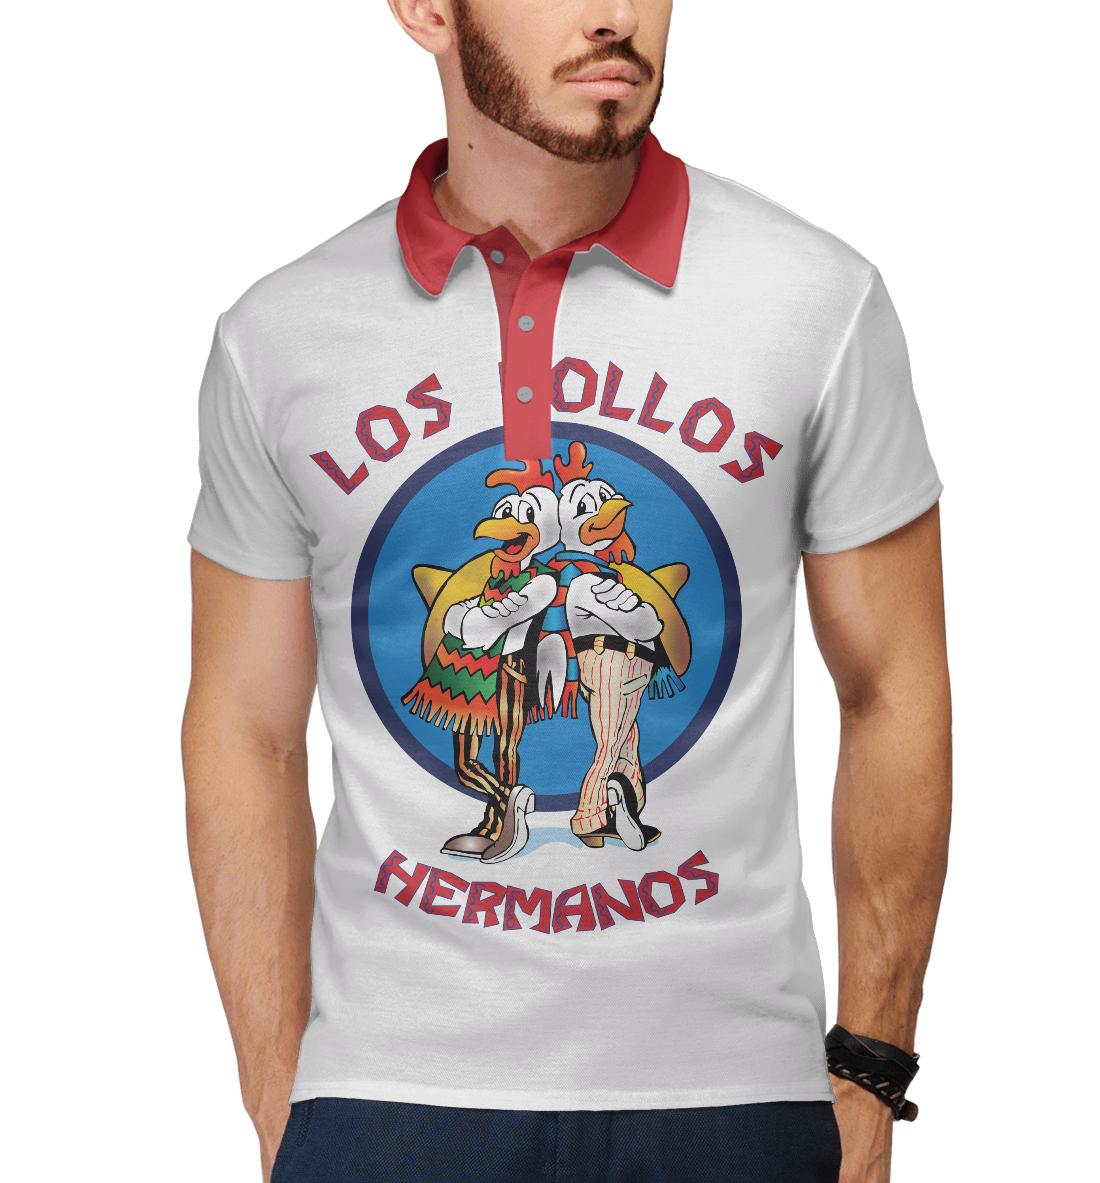 Купить Los Pollos Hermanos, Printbar, Поло, VVT-780401-pol-2